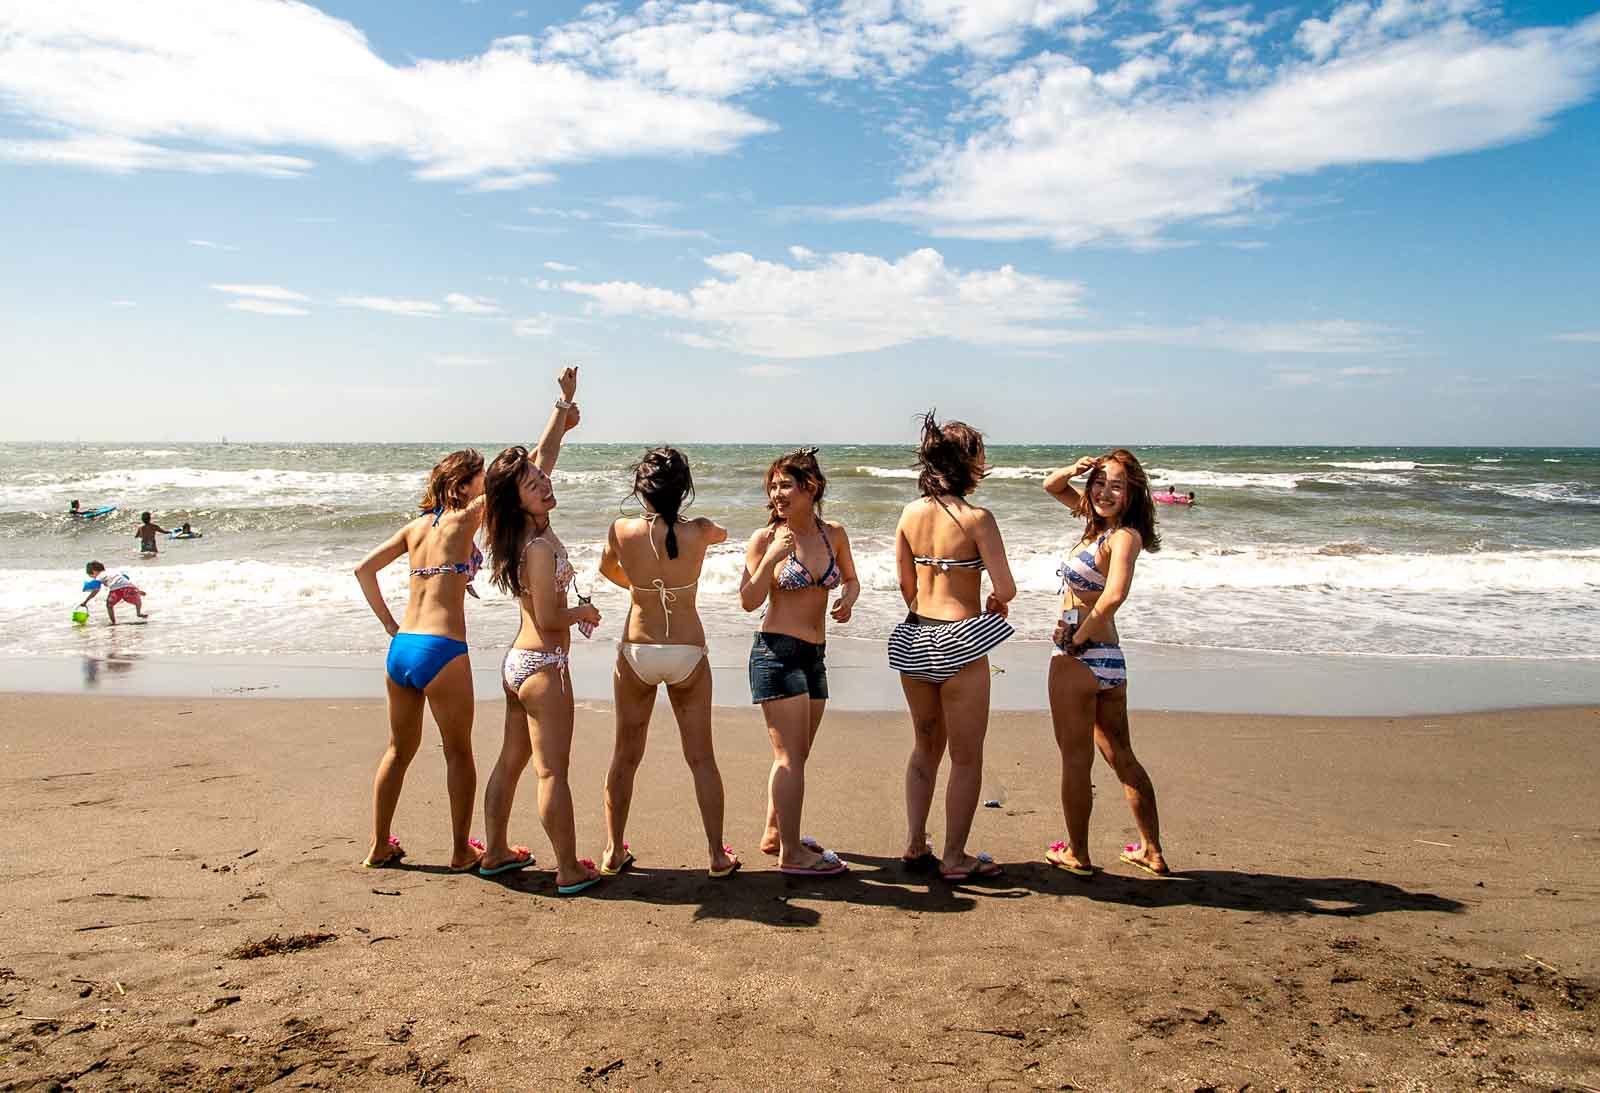 Japanese women in bikinis at Yuigahama Beach in Shonan, Japan, home of the 2020 Summer Japan Olympic sailing events